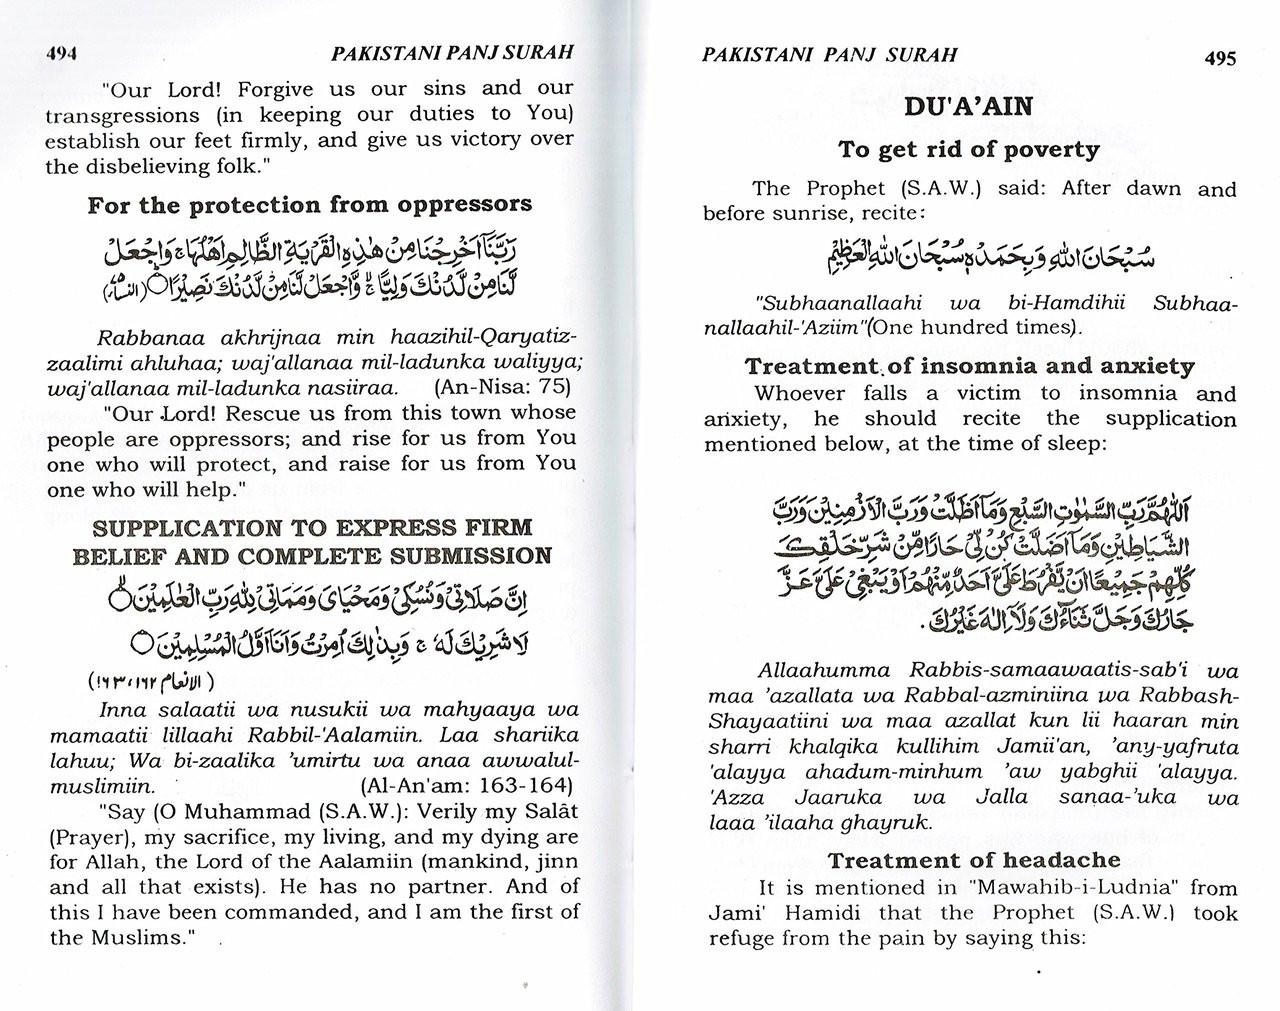 Pakistani panj surah with english translation transliteration panj surah with english translation transliteration kristyandbryce Gallery